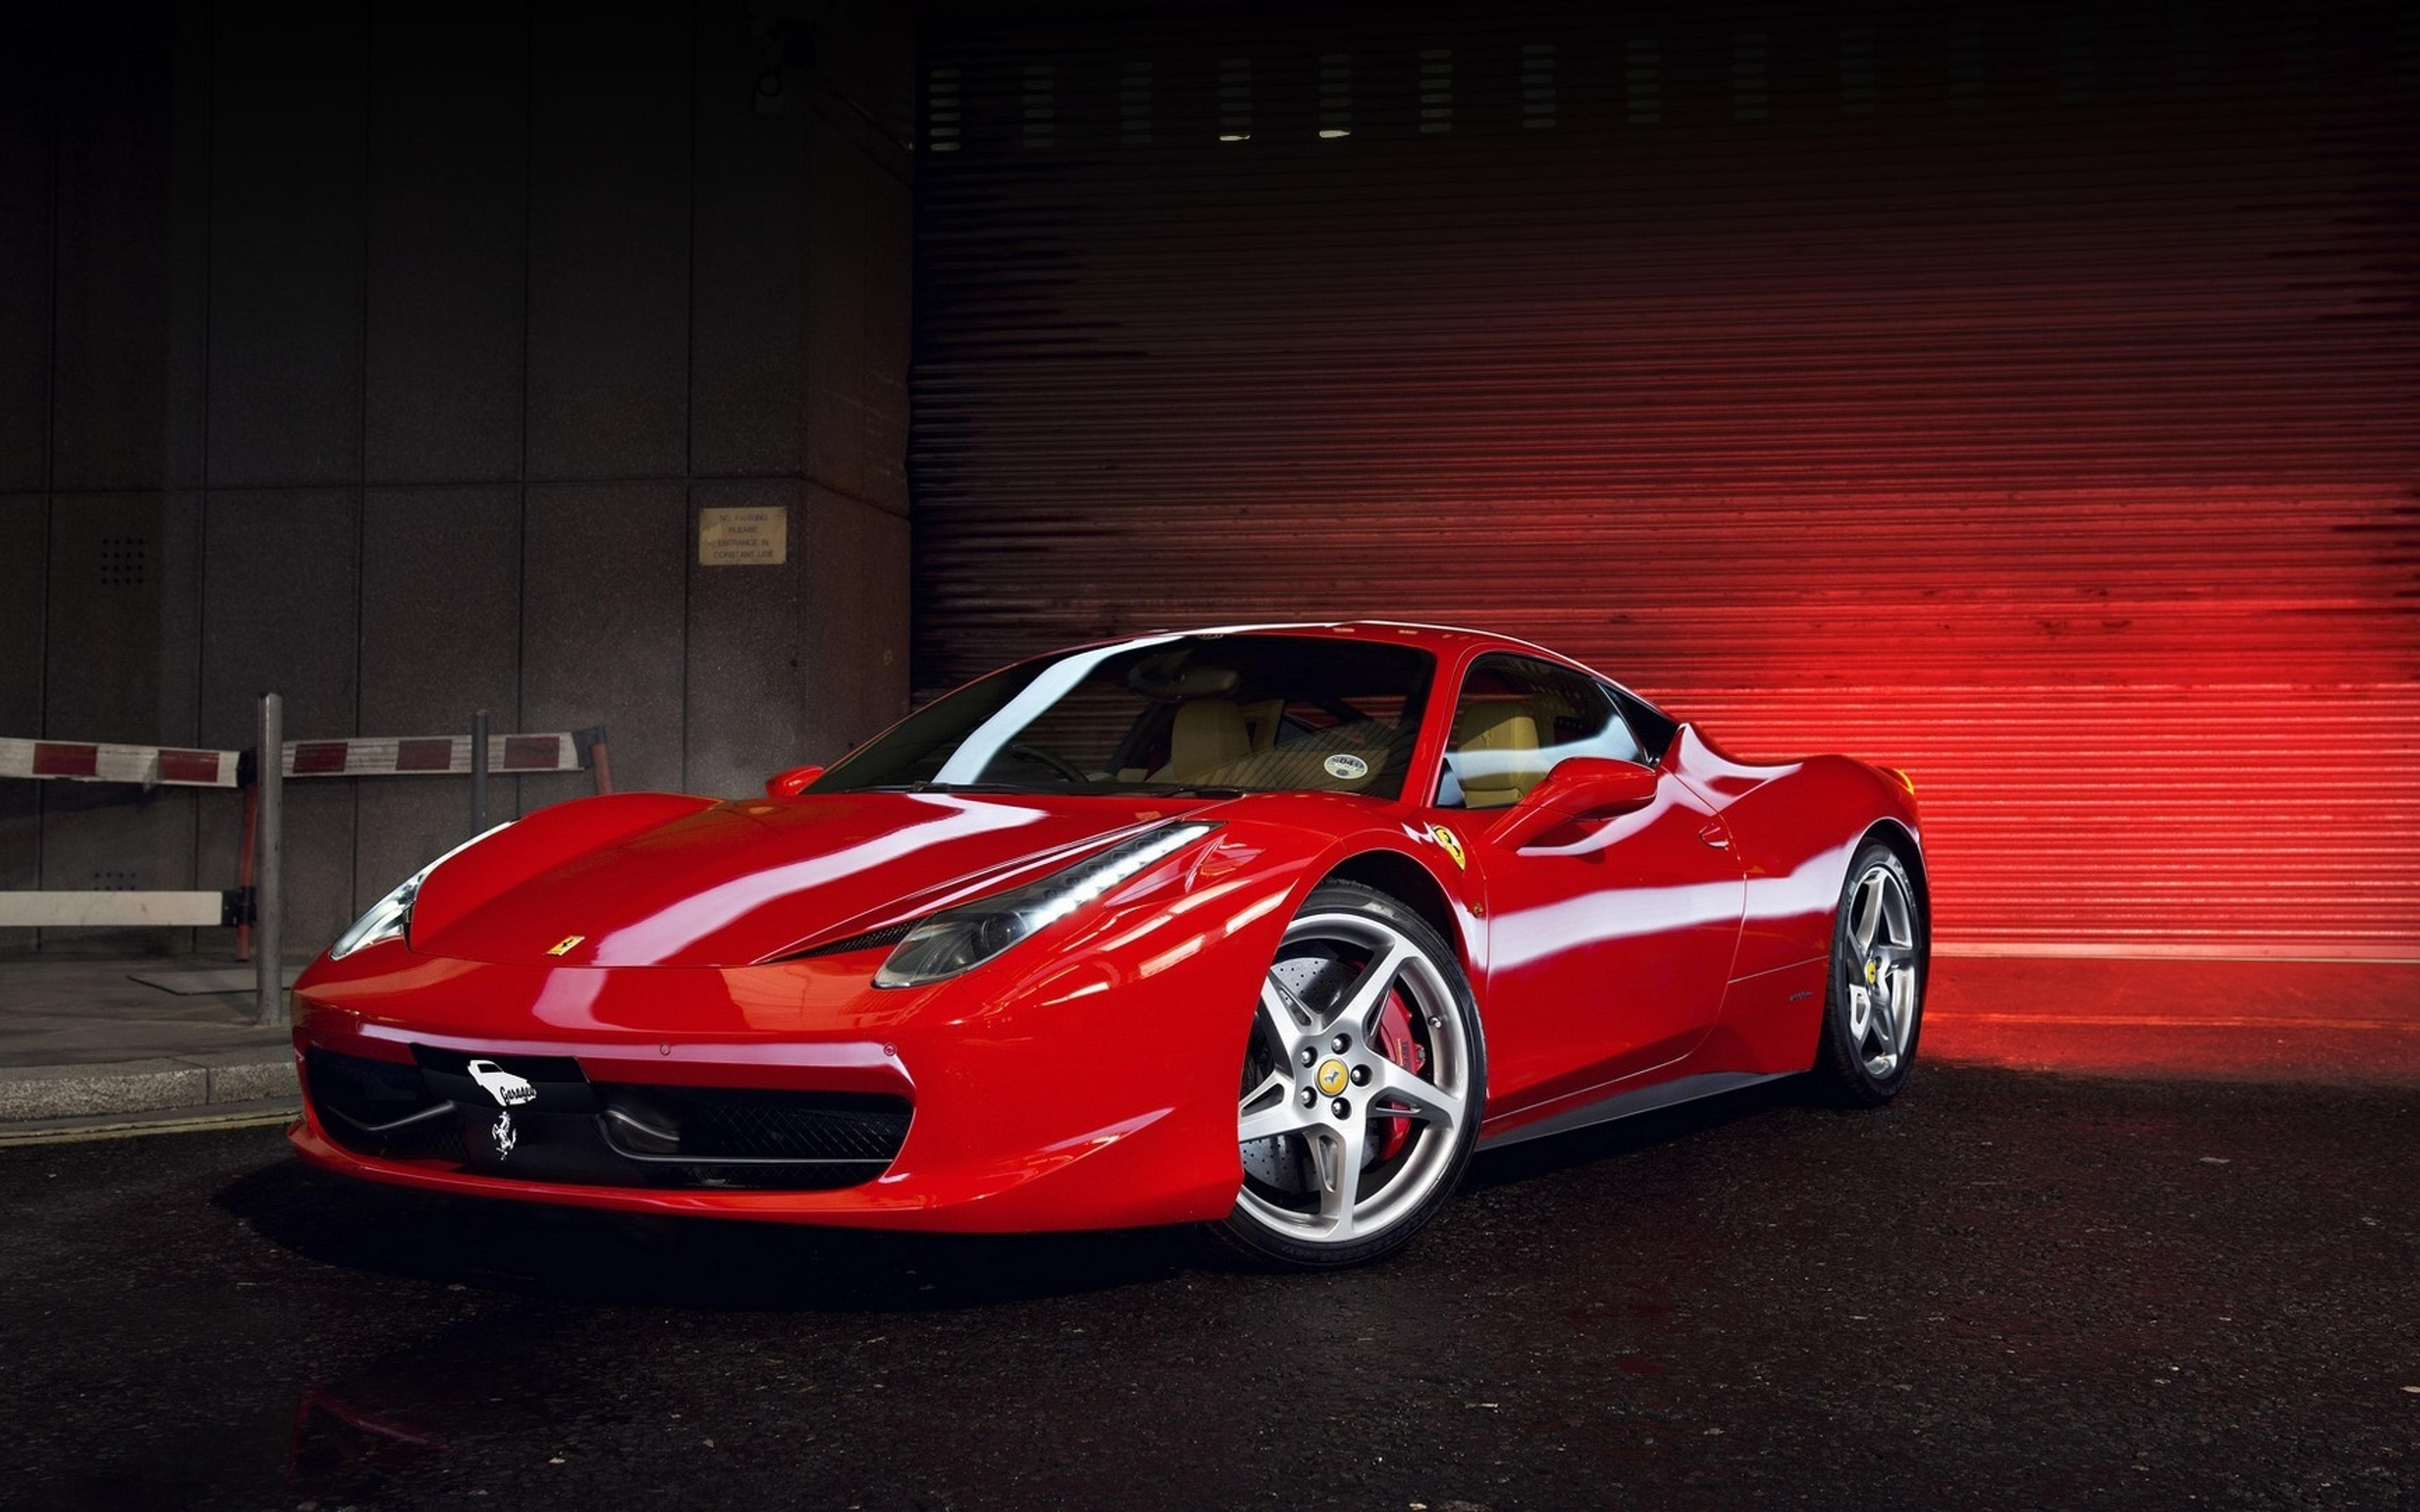 Garage Sports Car : Red ferrari in garage sport car wallpaper download